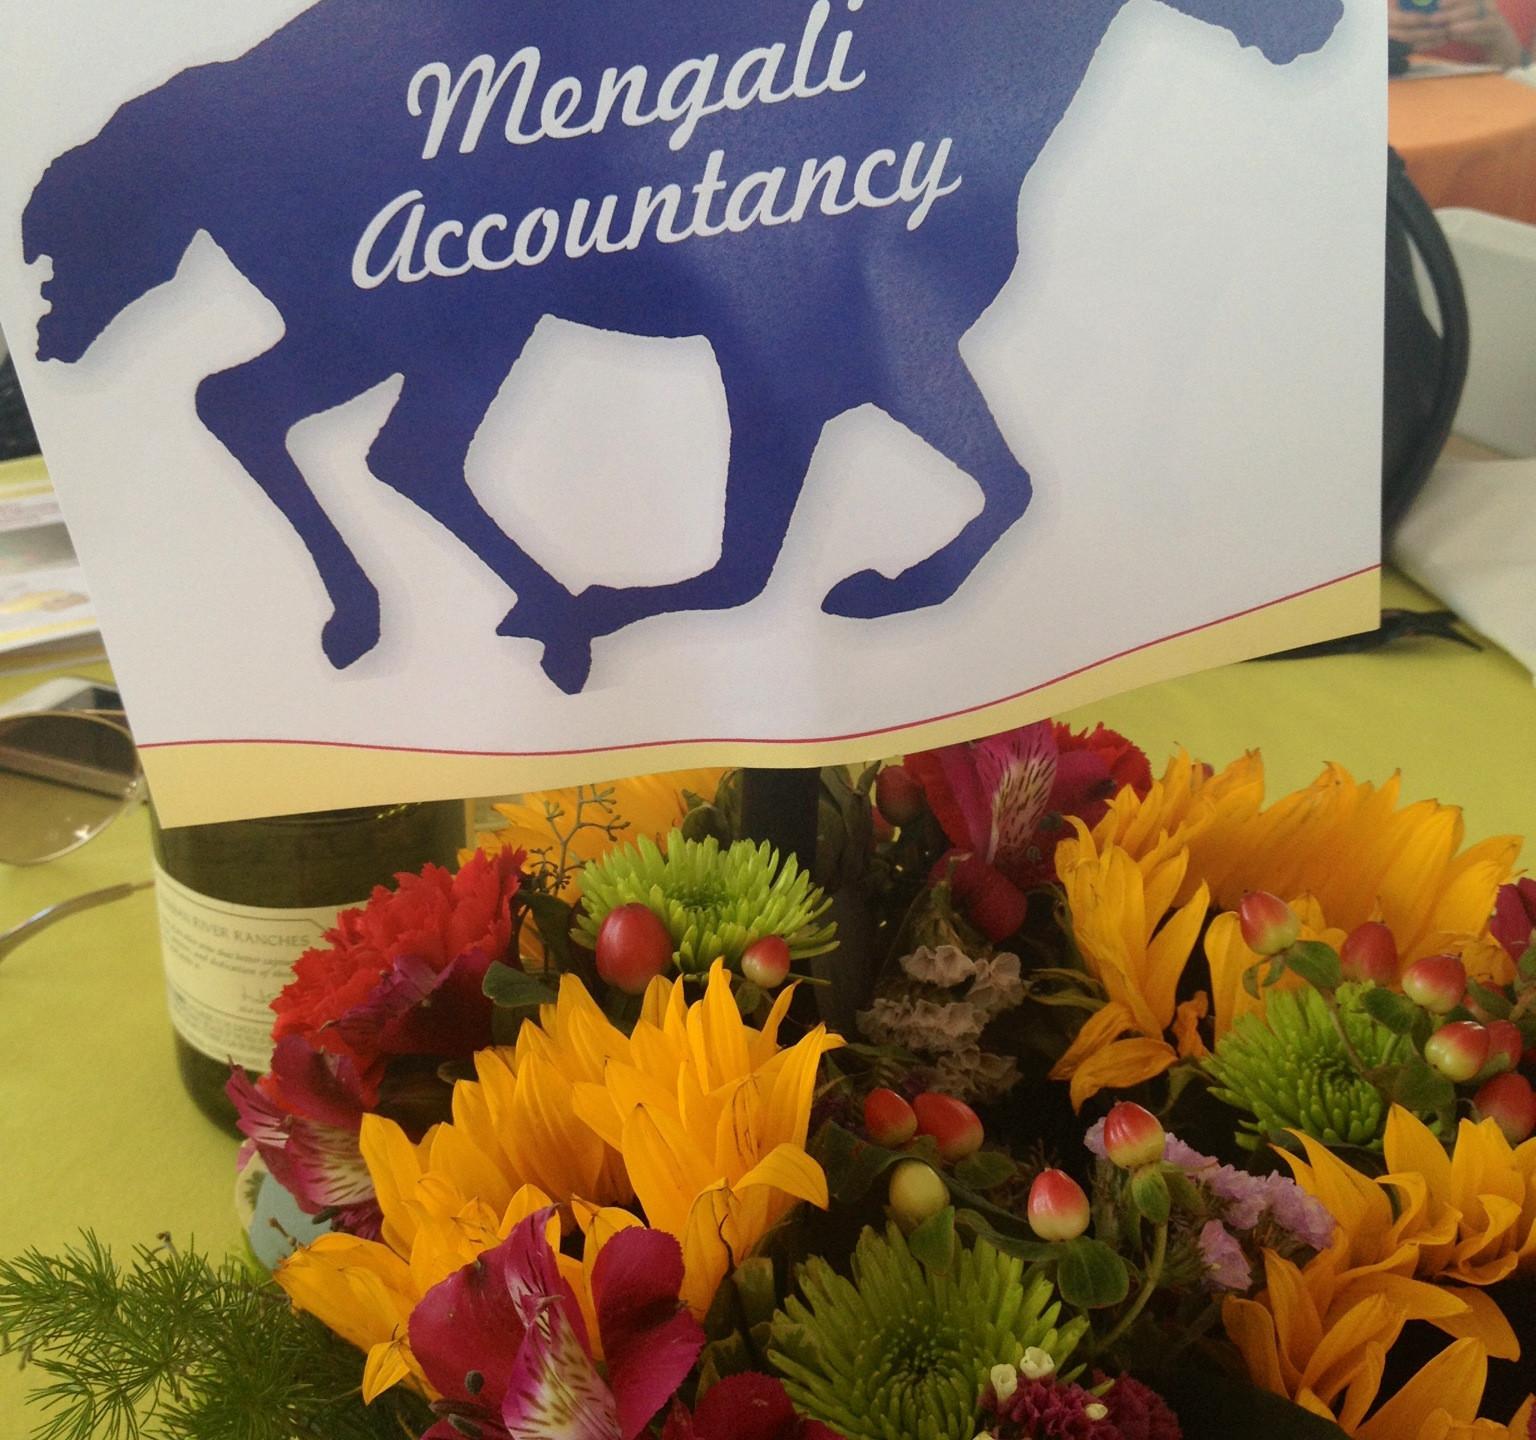 Mengali Accountancy's Table